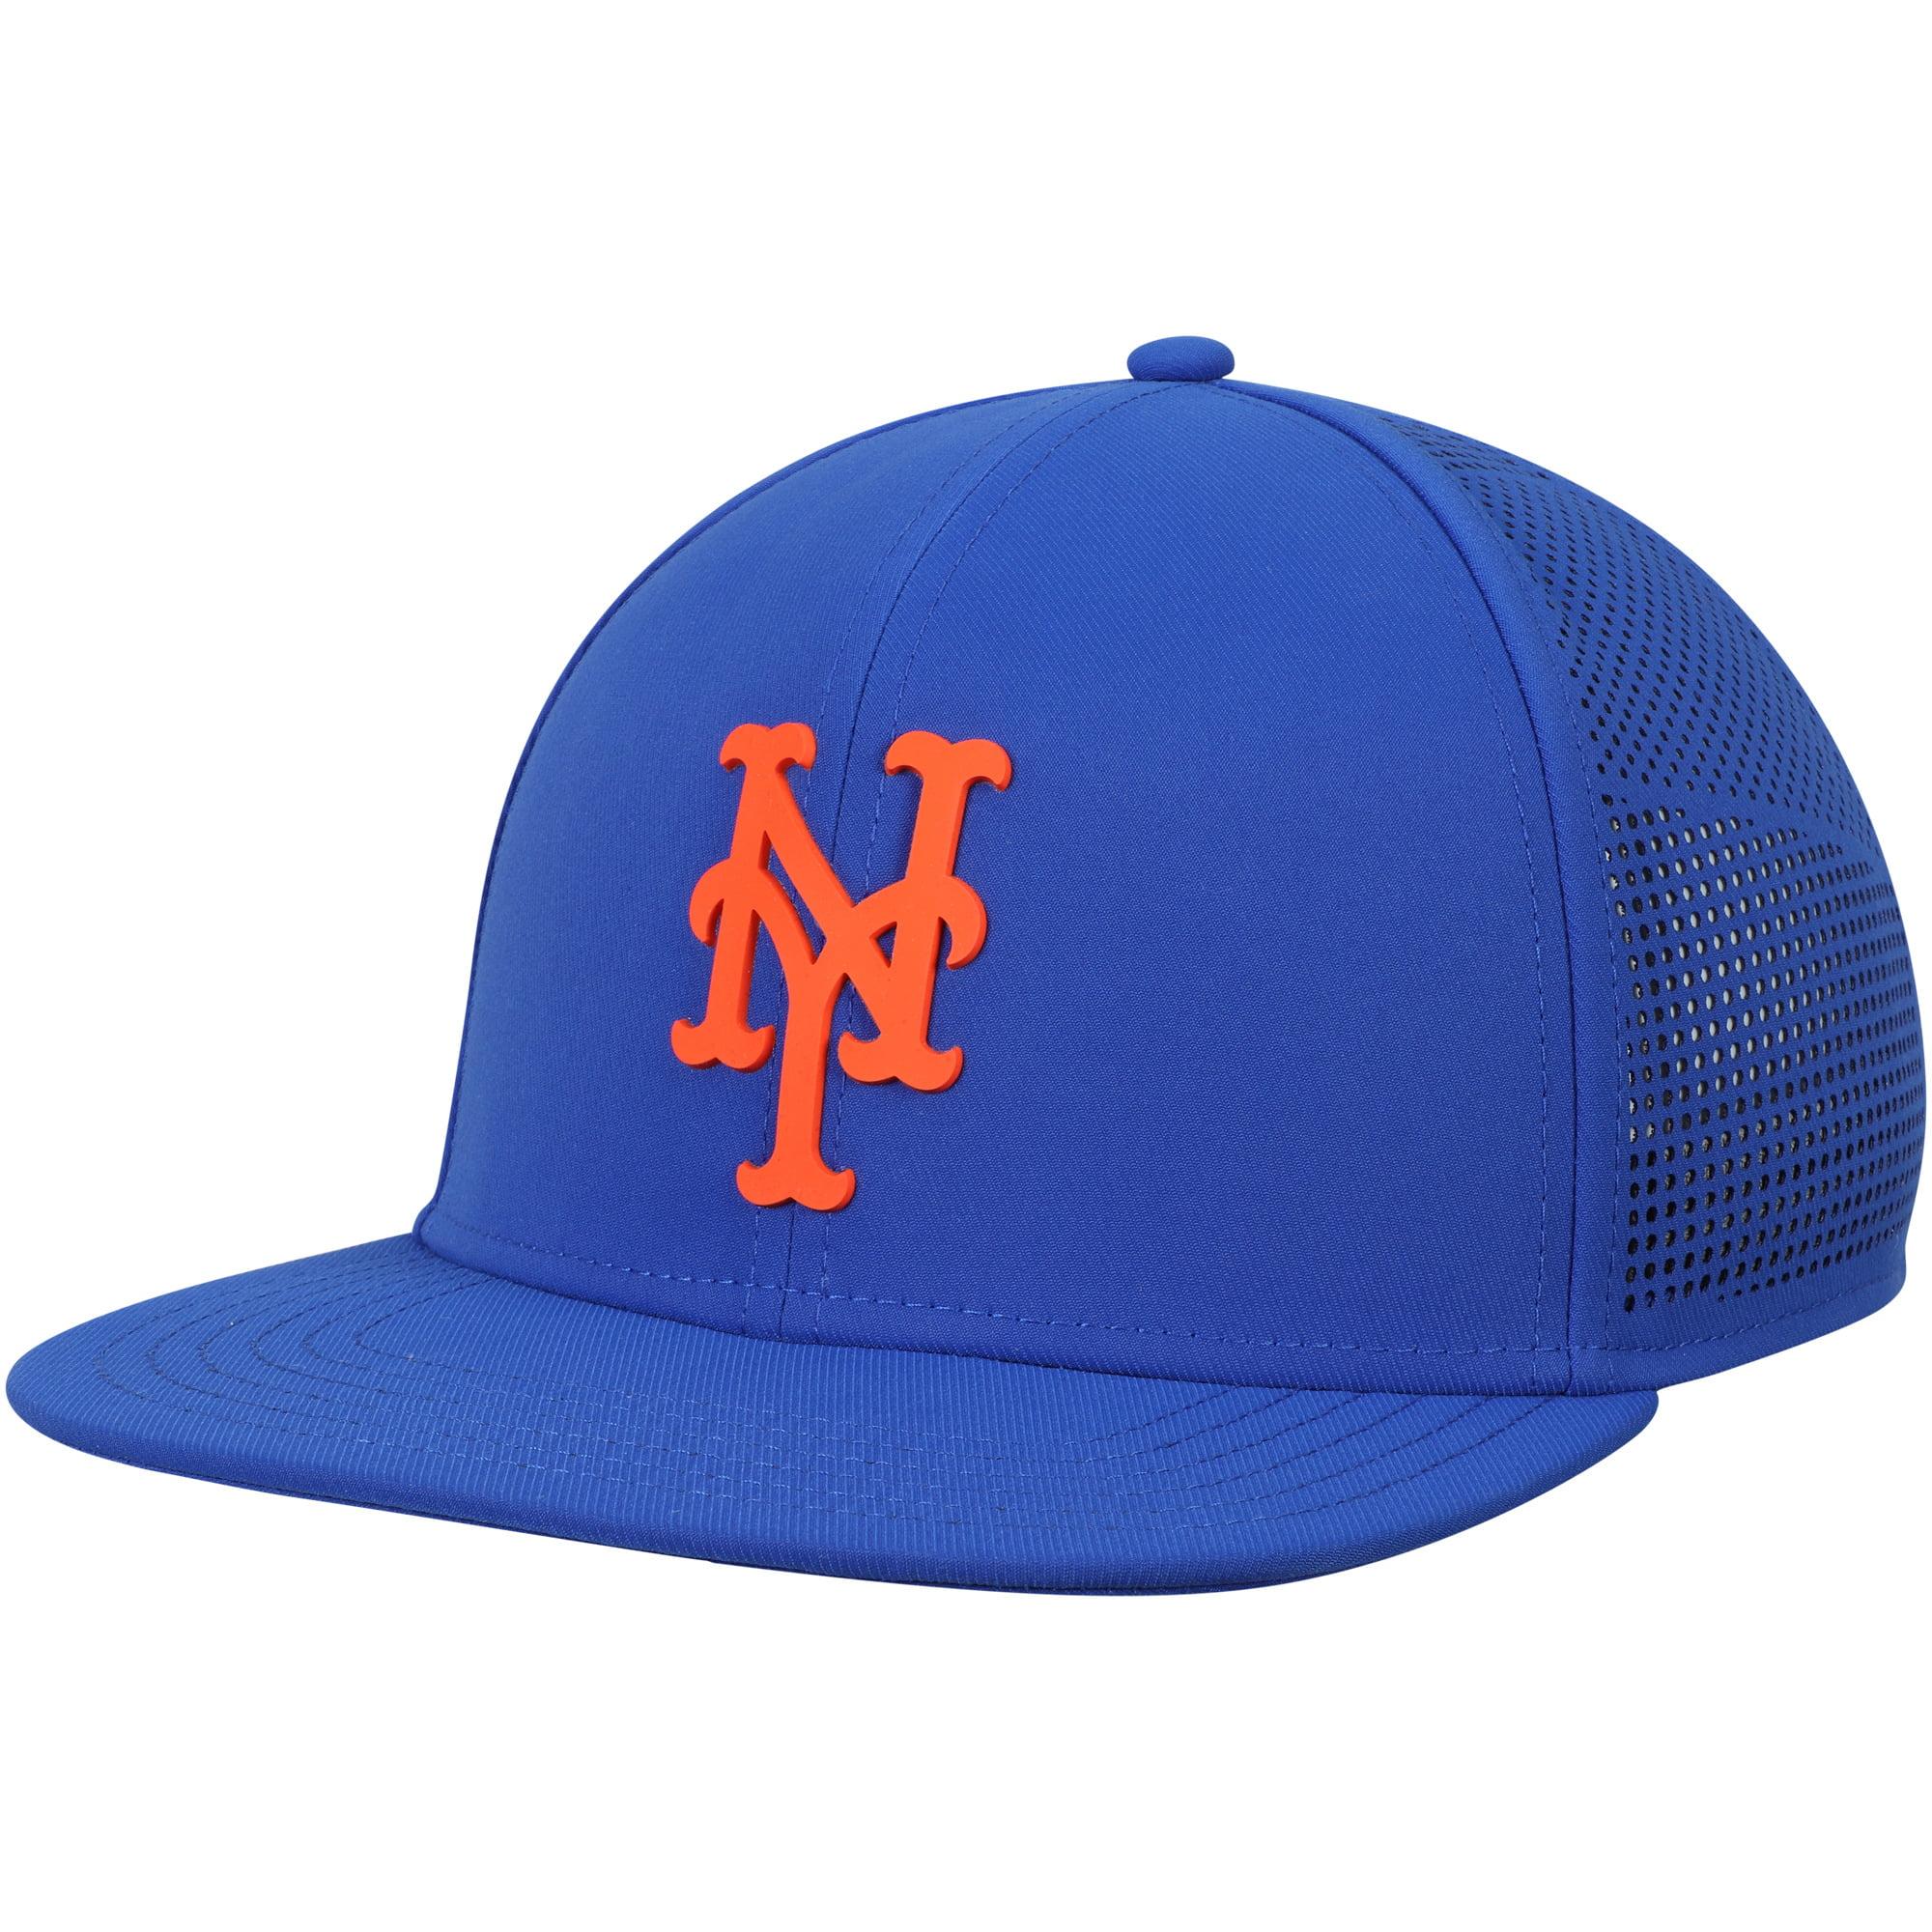 New York Mets Under Armour Supervent Snapback Adjustable Hat - Royal - OSFA